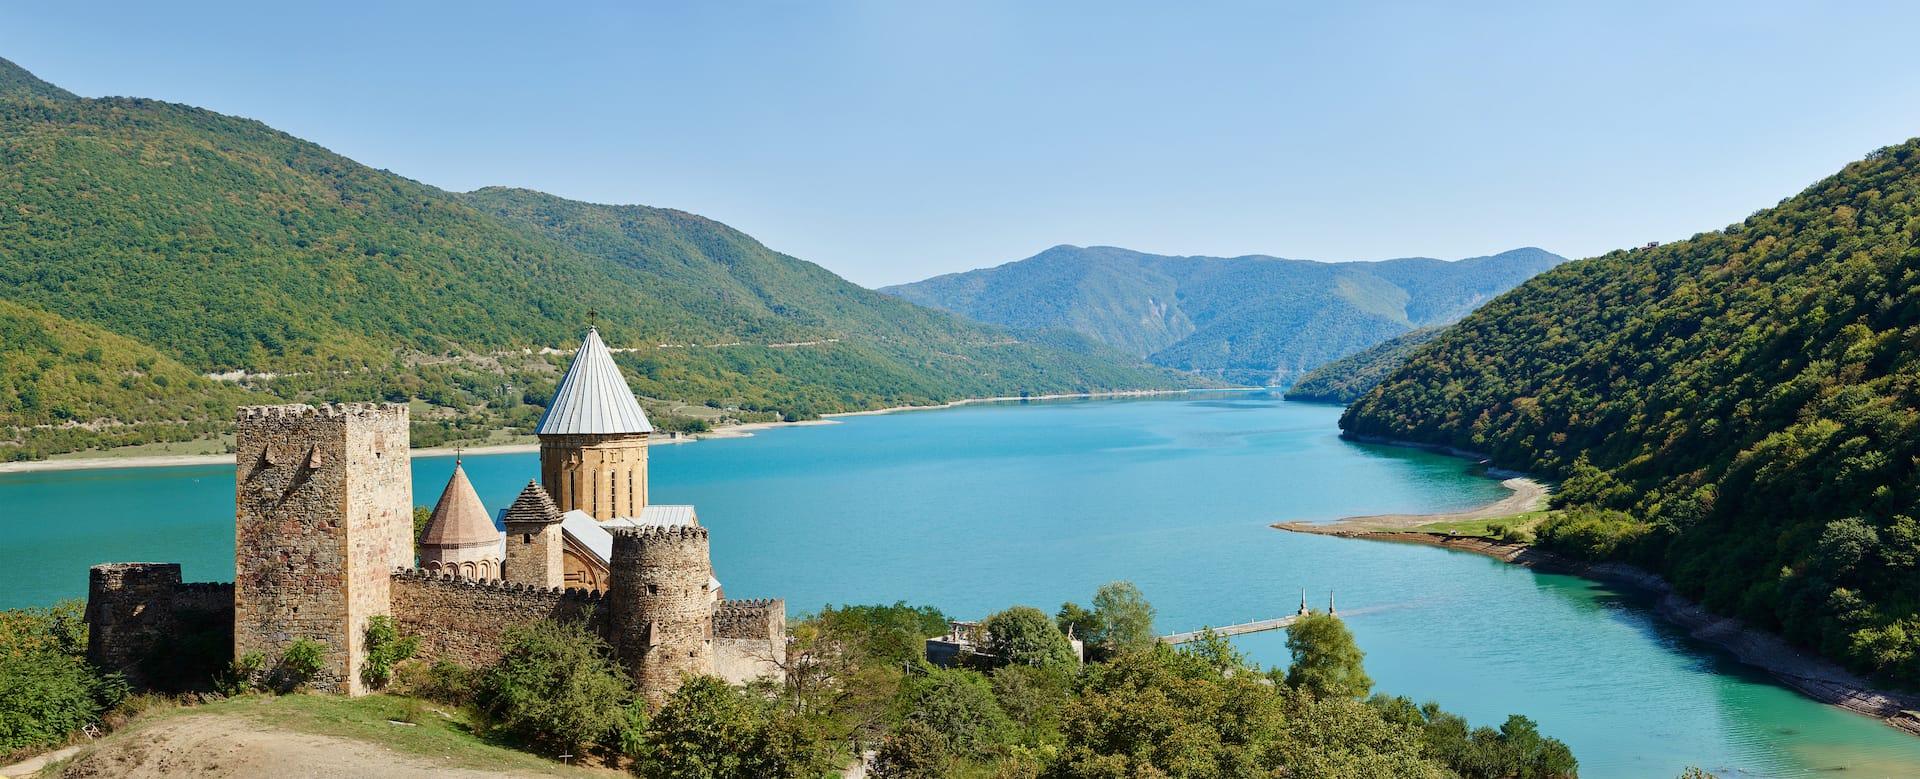 Introducing Georgia - Ananuri Church   Tailor Made Holidays to the Caucasus